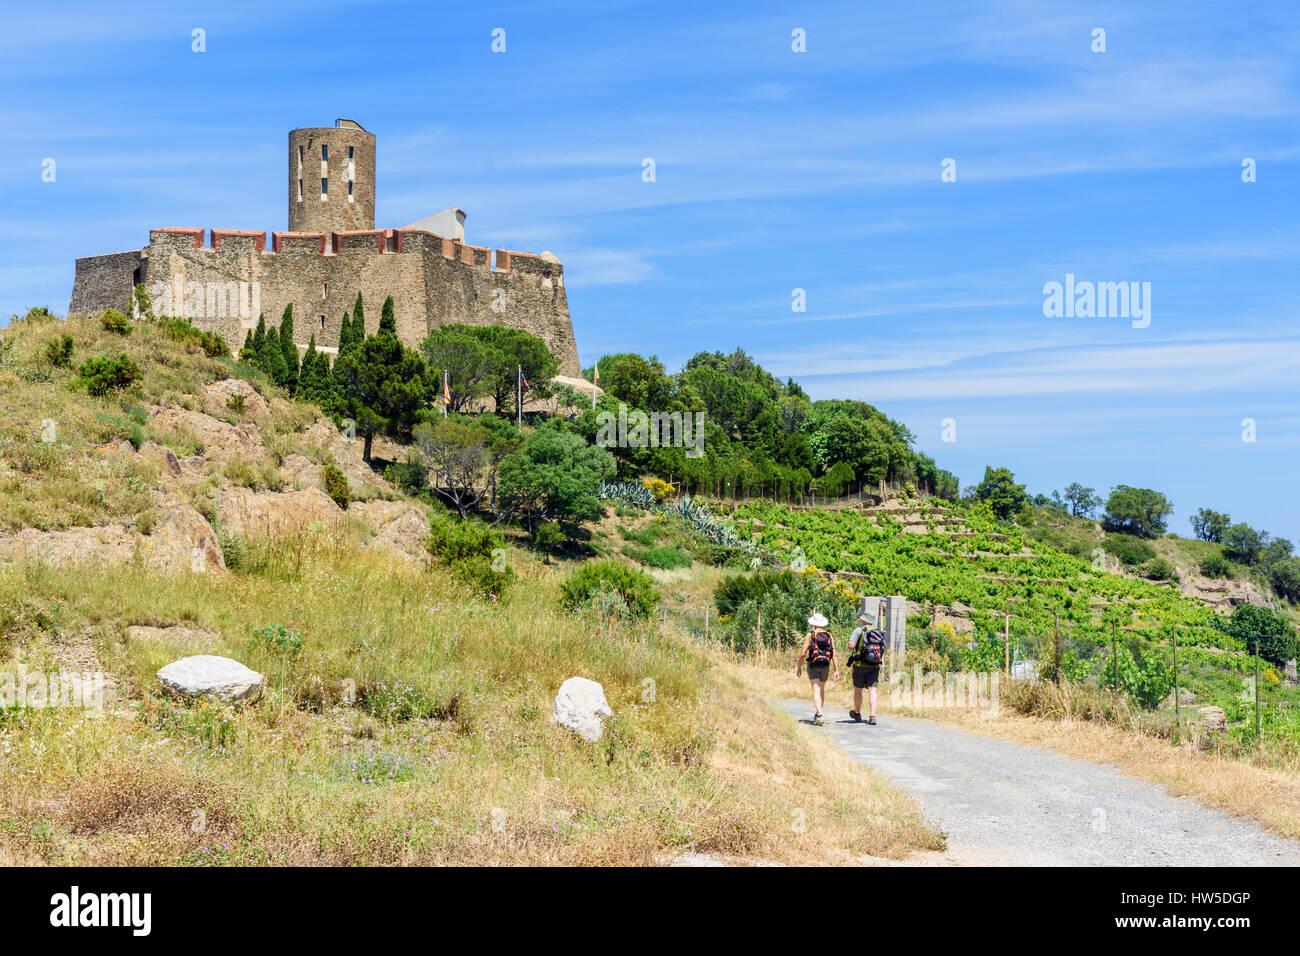 Walkers on the way to the landmark Fort Saint Elme, Collioure, Côte Vermeille, France - Stock Image